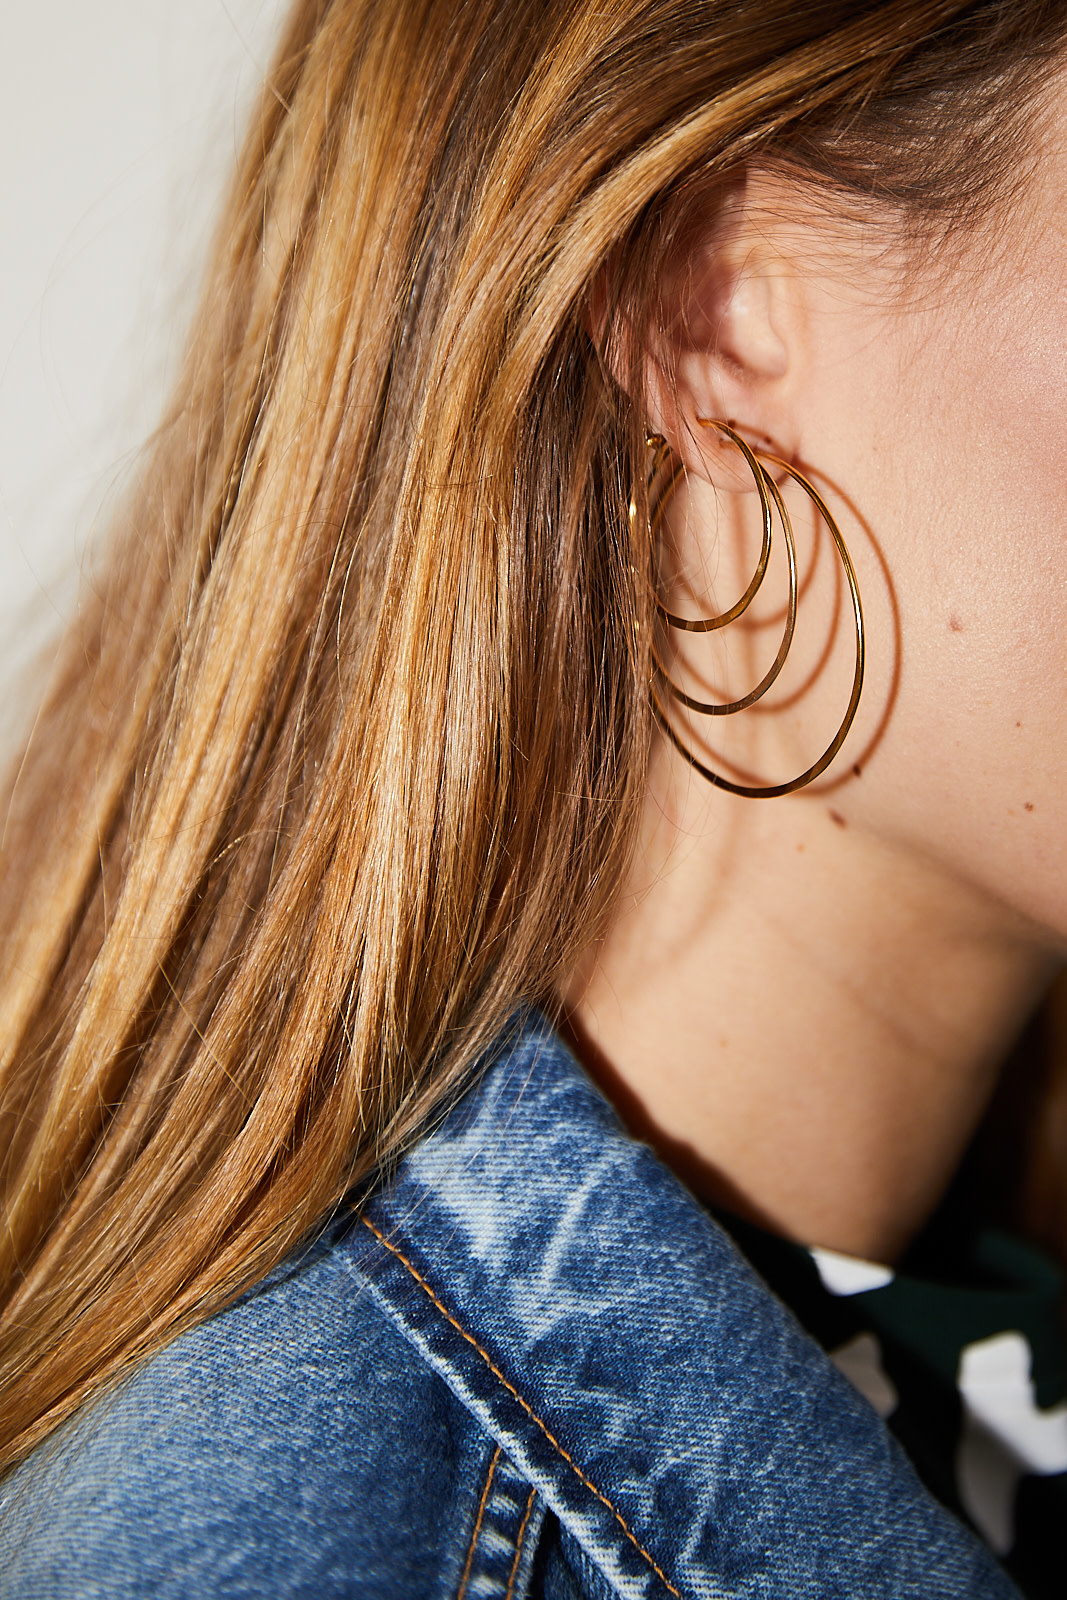 Martine Viergever LIfe earrings 40mm